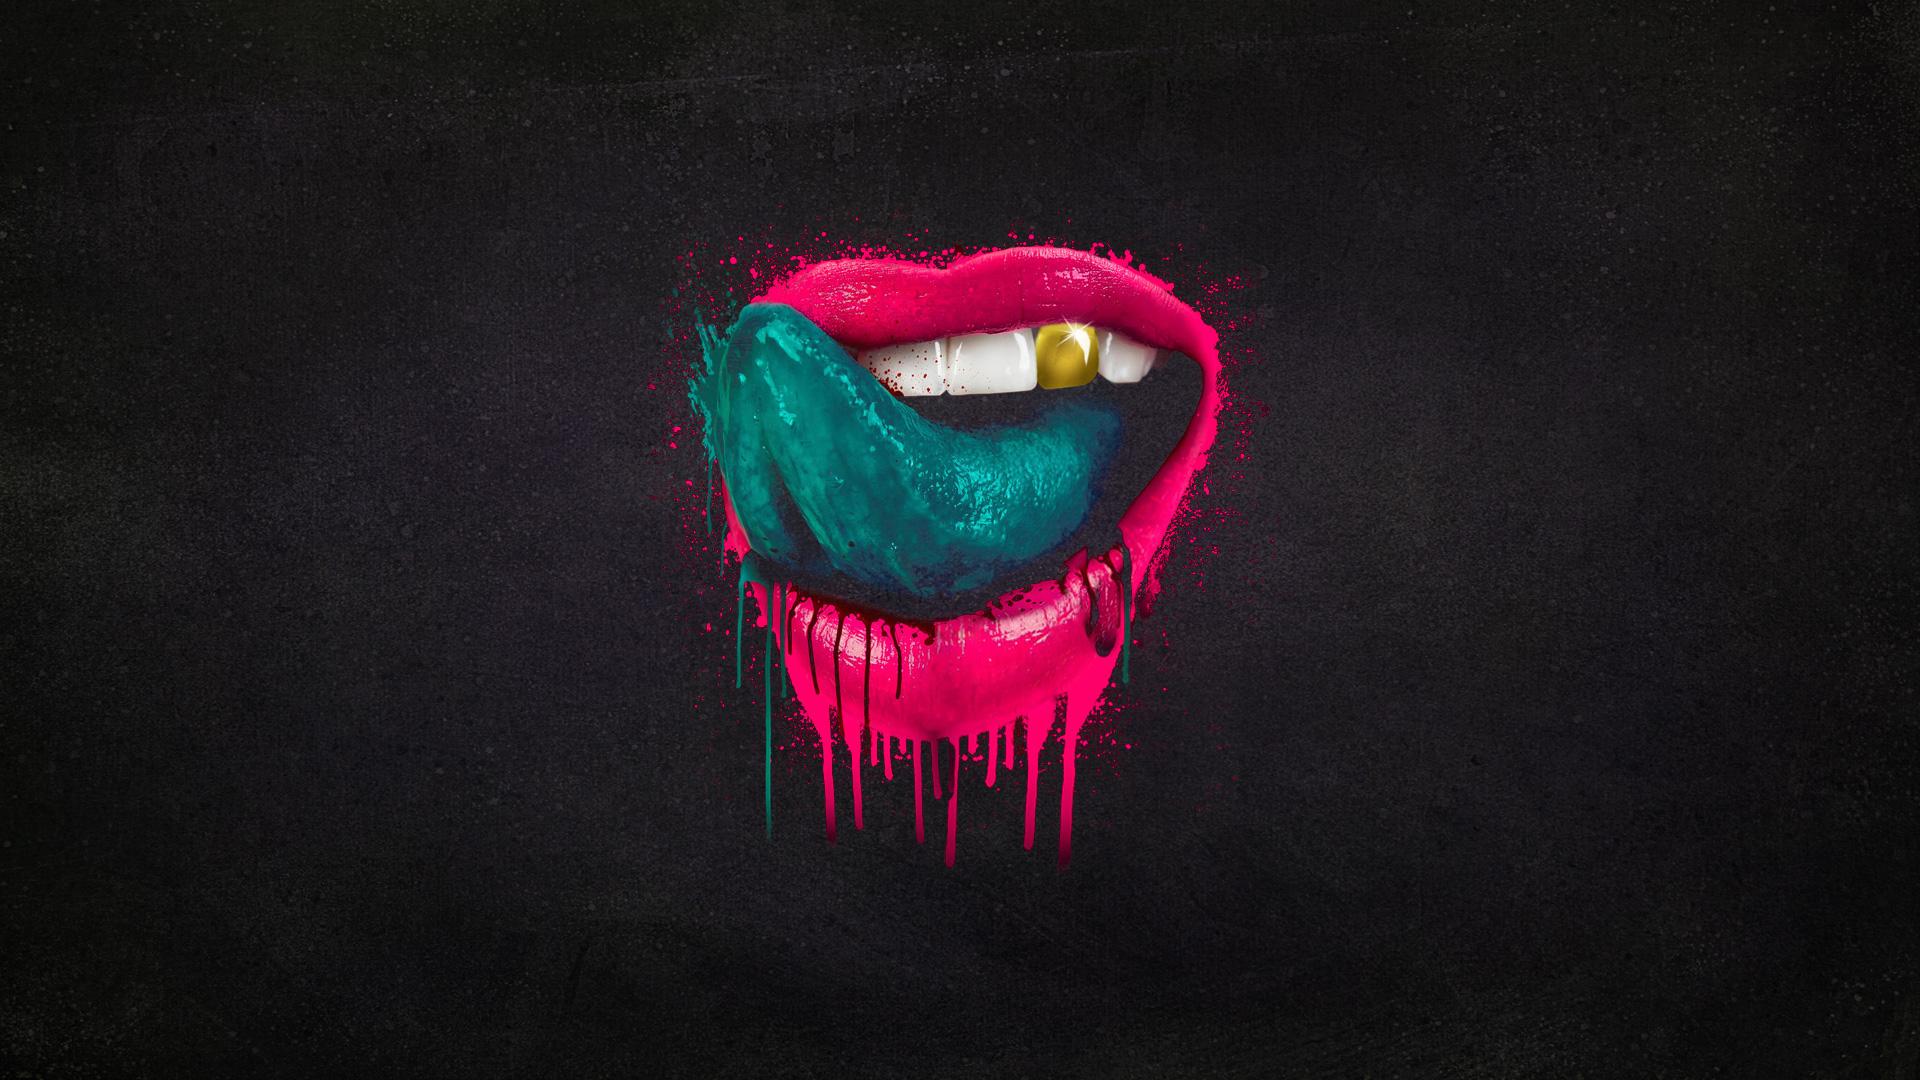 Falling In Reverse Lips Wallpaper Mouth Tongue Splatter Lips Paint Wallpaper 1920x1080